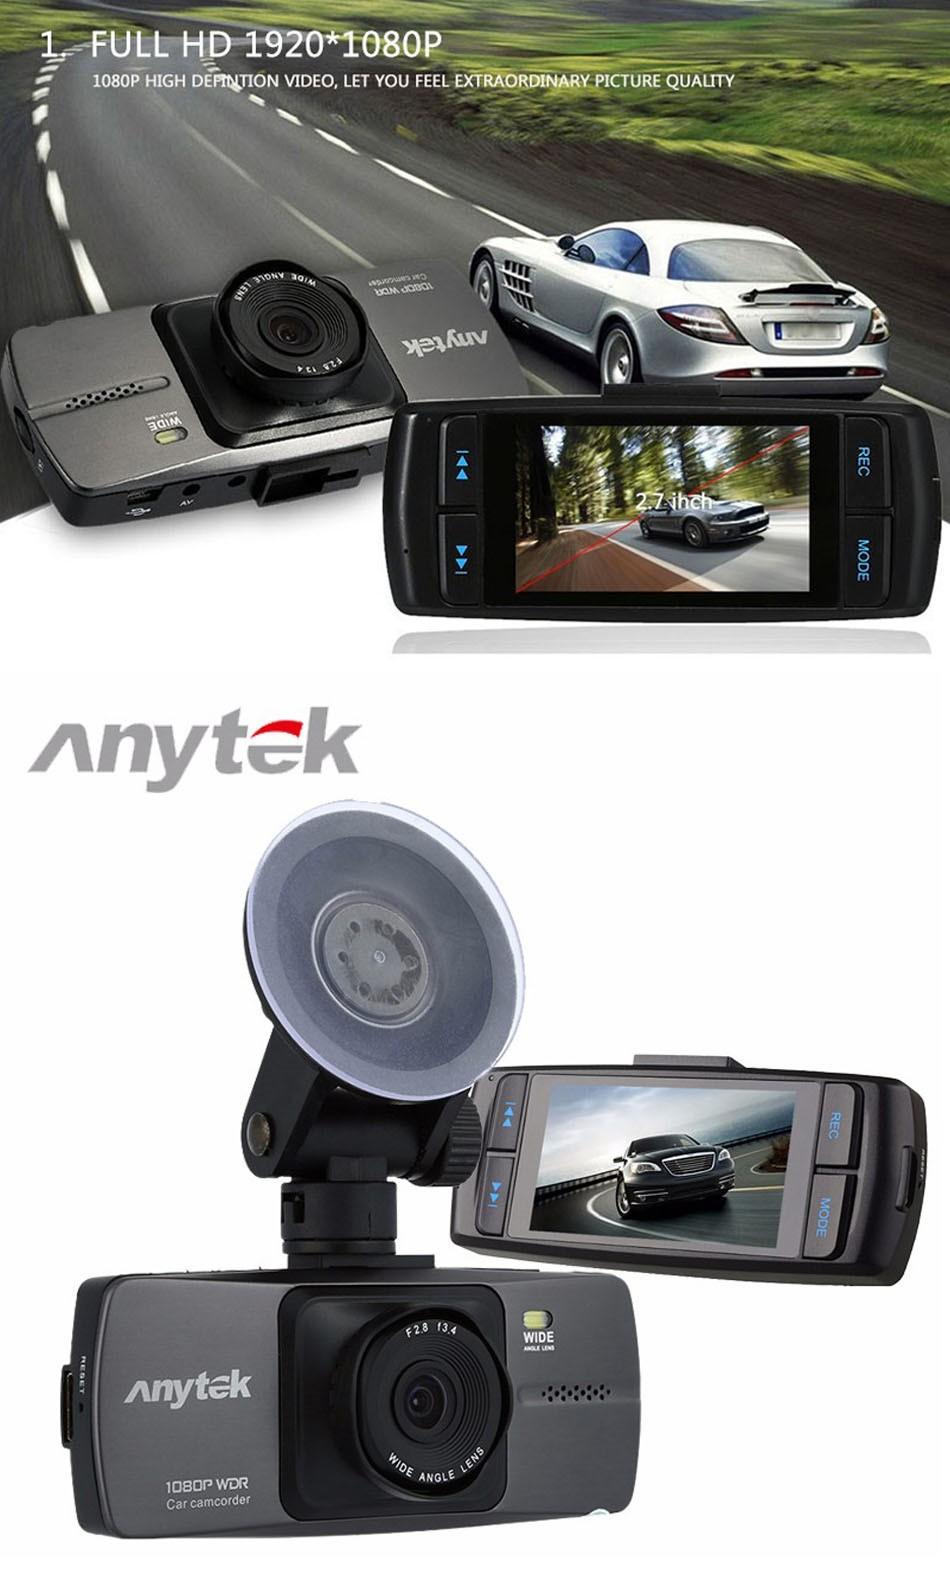 Anytek Dash Cam A88 2.7 Inch DVR Full HD 1080P Car Camera Novatek 96220 Parking Monitor Registrator Video Recorder Night Vision DVRS -01